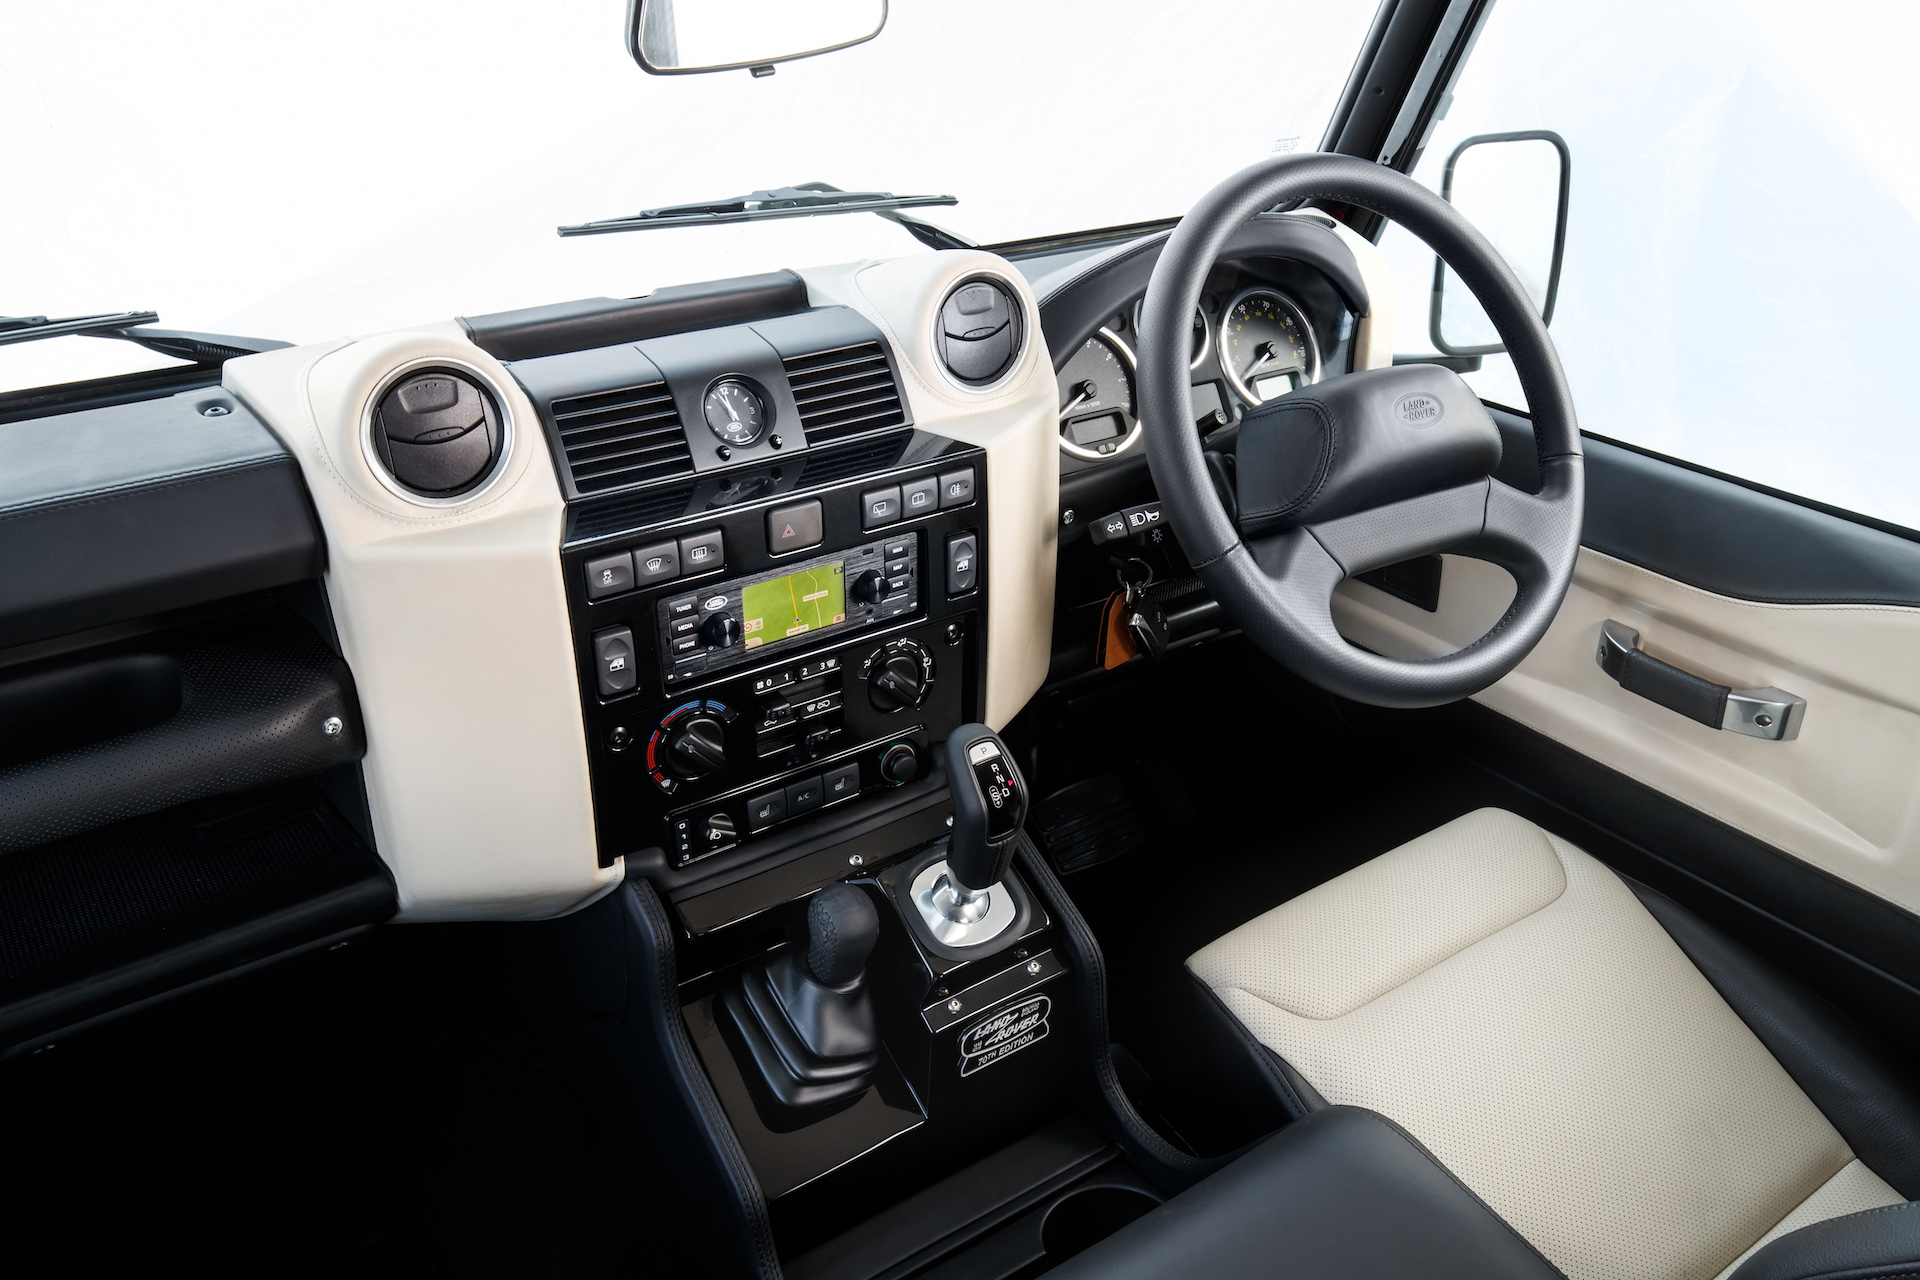 Land Rover Defender V8 interni pelle chiara